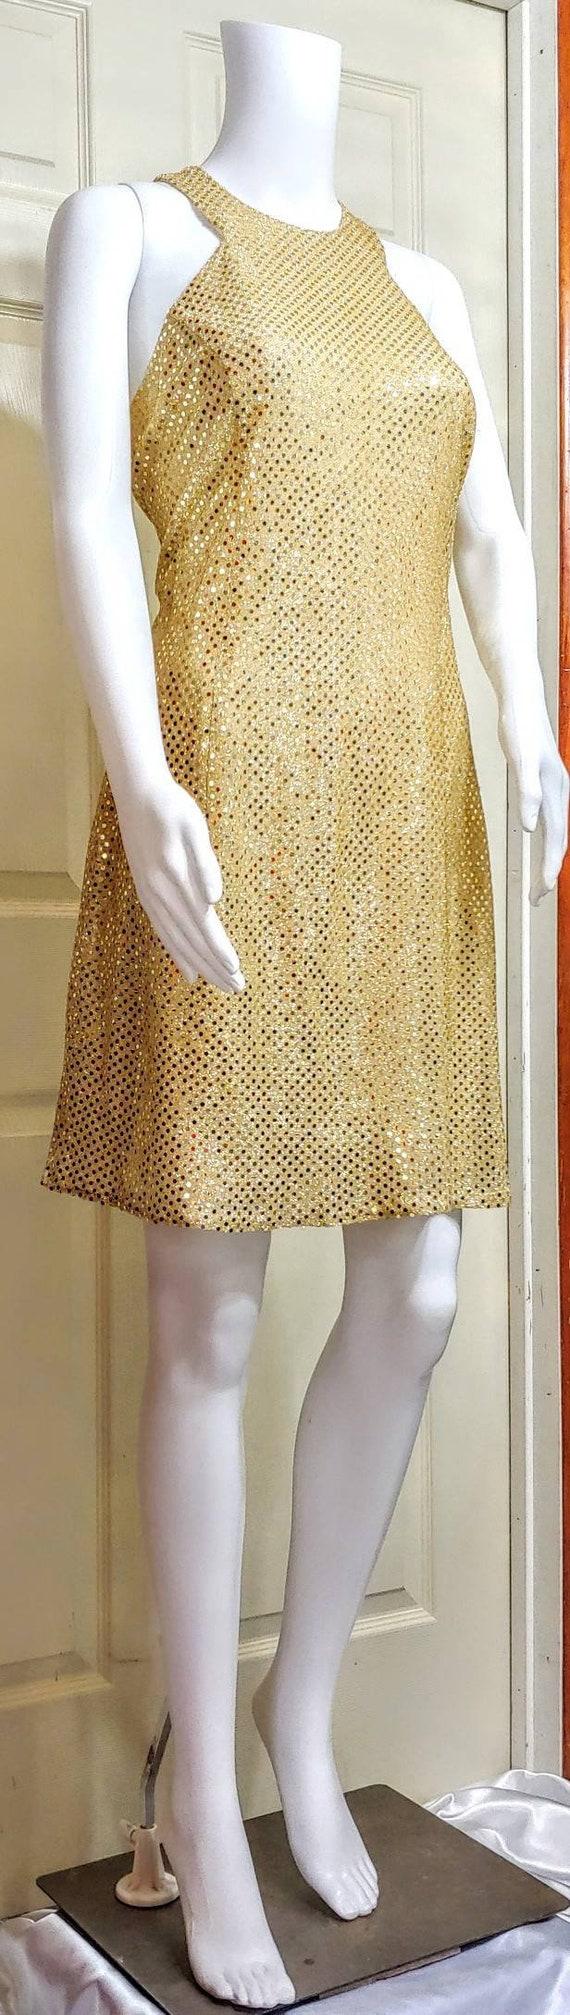 Jessica McClintock Gunne Sax Party Dress - image 3